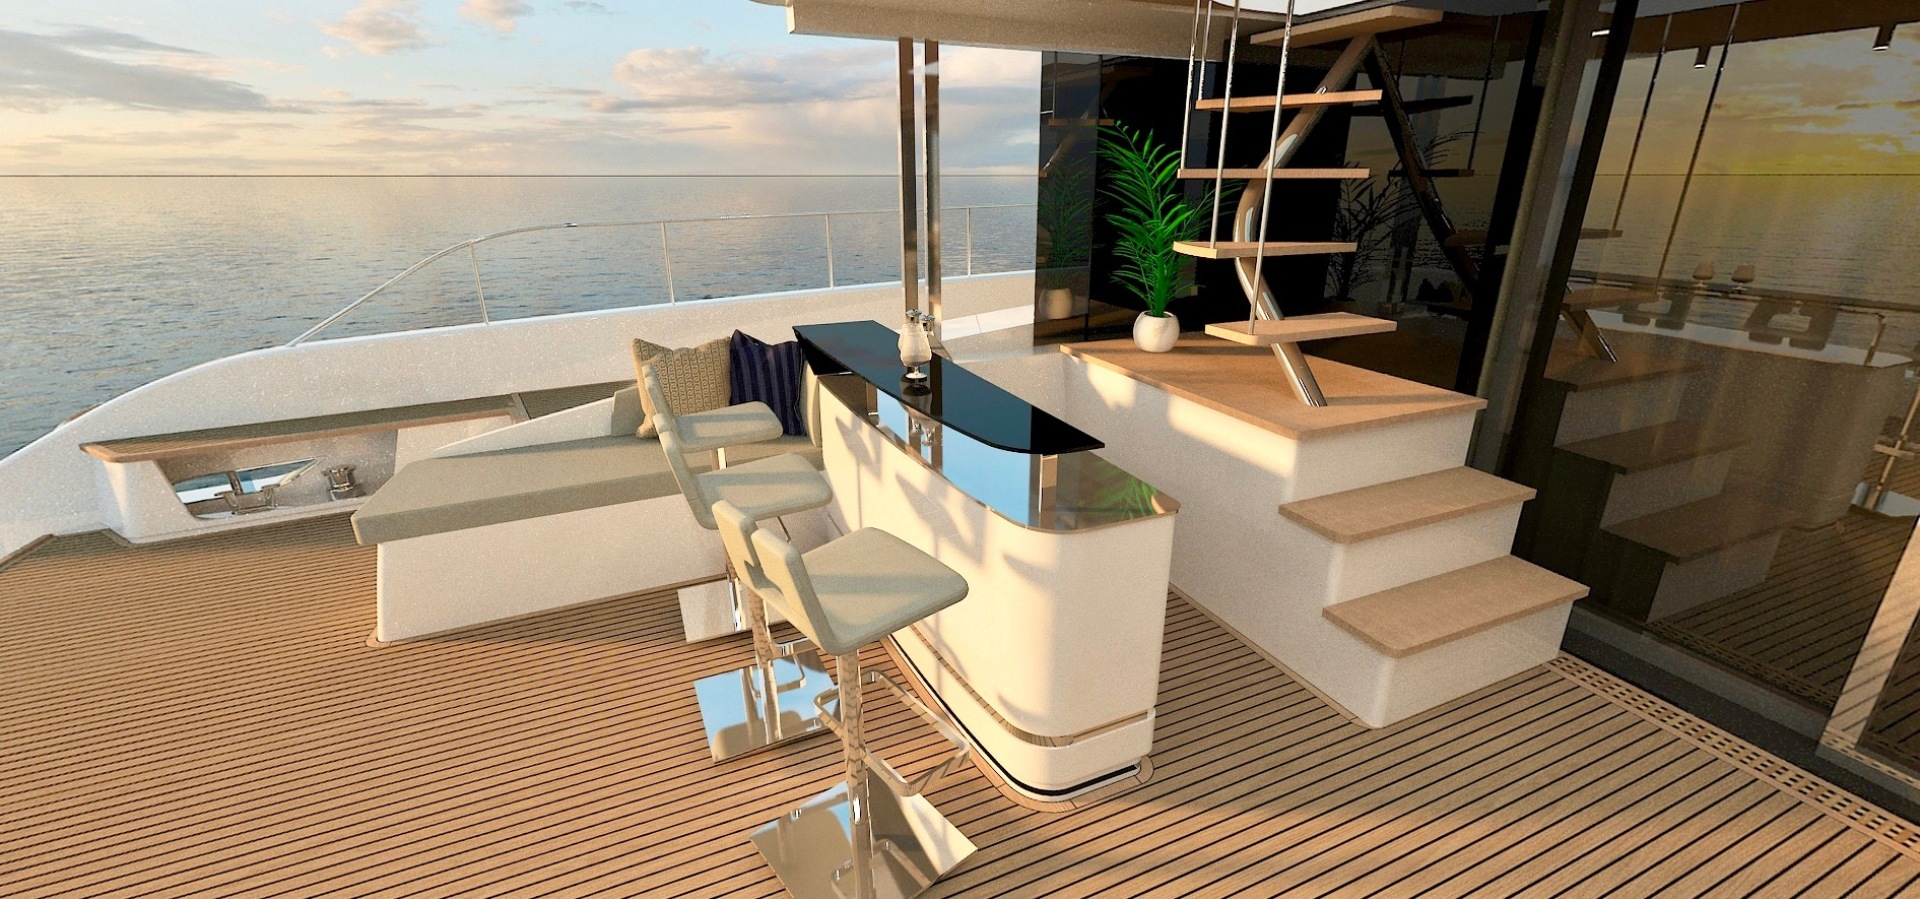 Silent-Yachts-Silent 80  2020-SILENT 80 Ancona-Italy-1262454 | Thumbnail